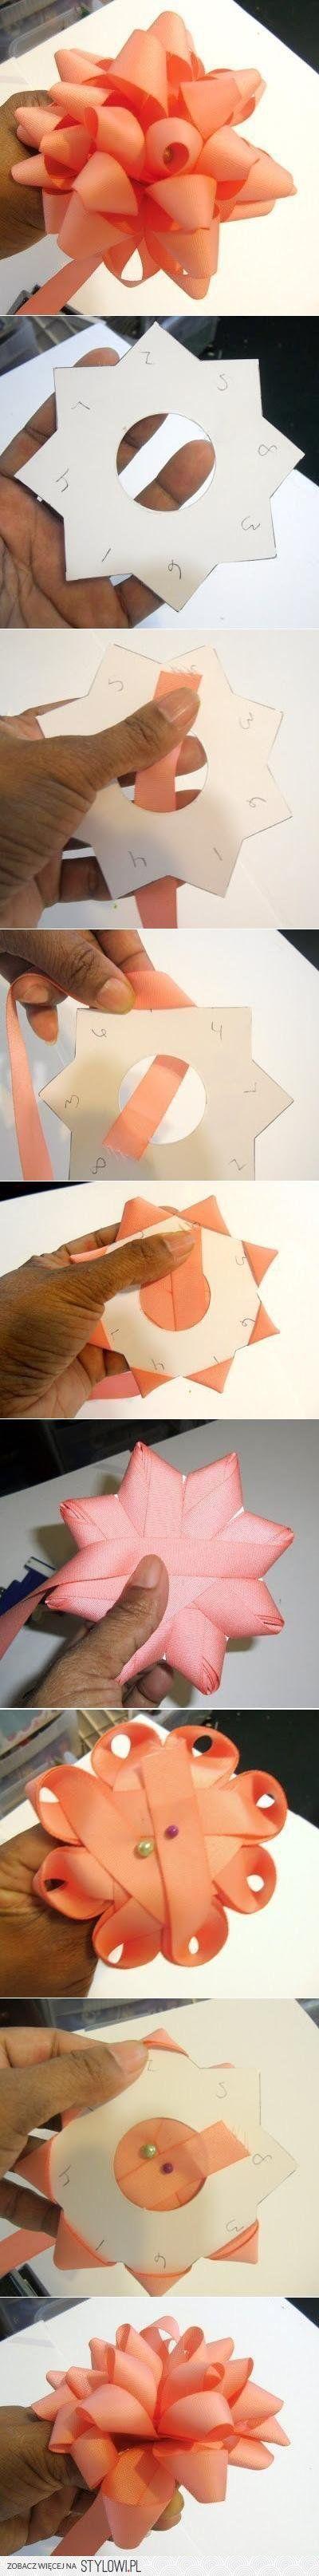 DIY Bow of Ribbon DIY Projects | UsefulDIY.com na Stylowi.pl